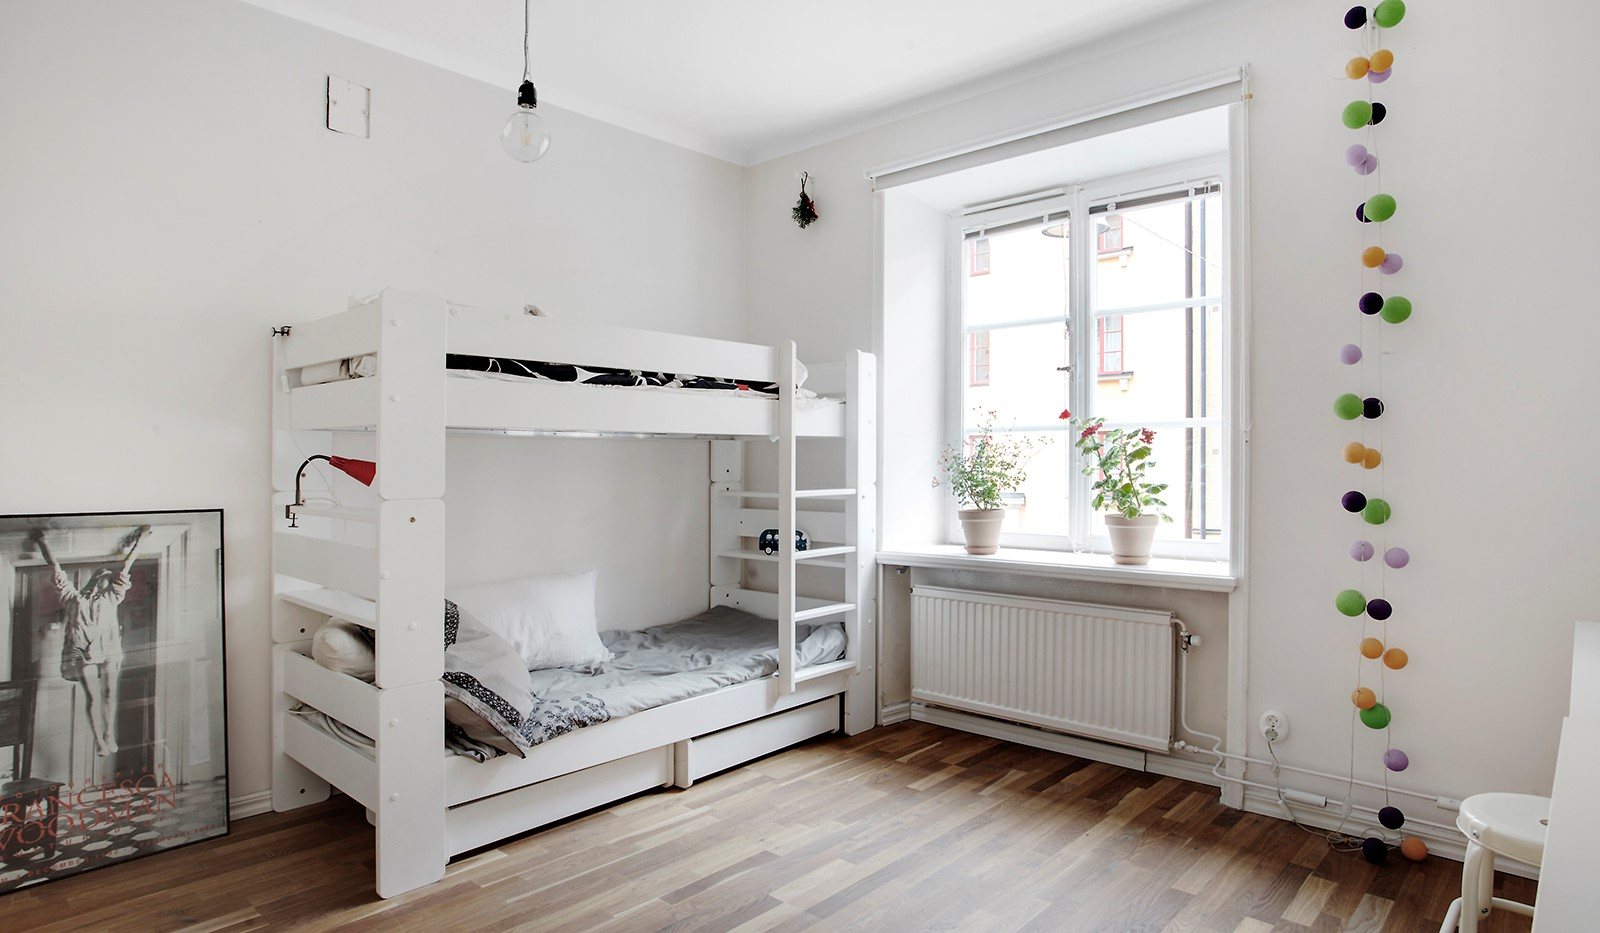 Heleneborgsgatan 30 - Stort sovrum